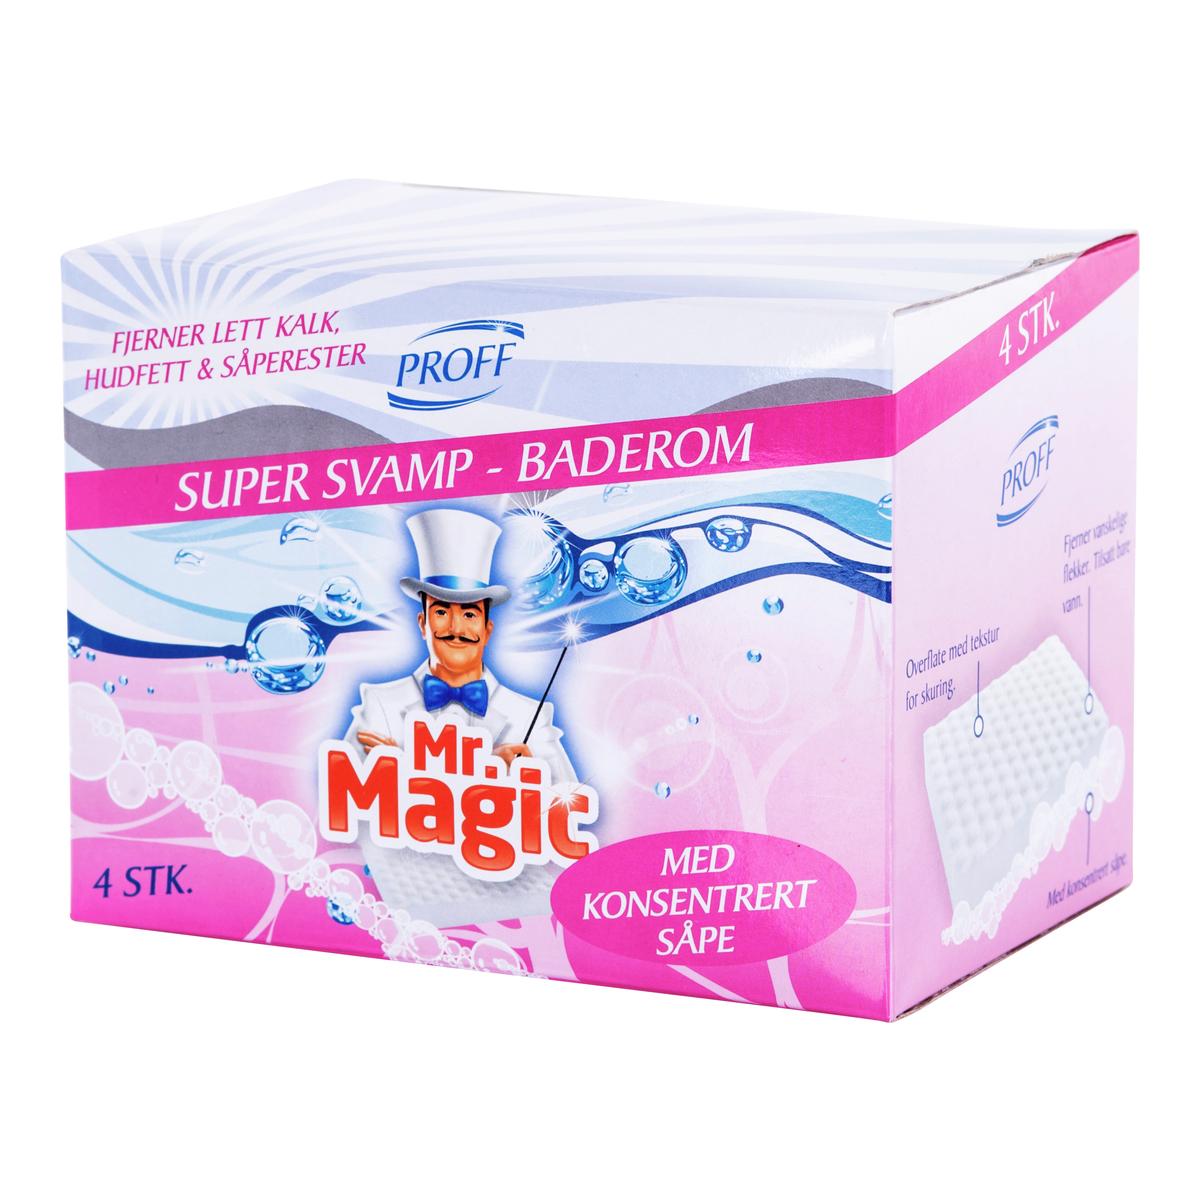 Supersvamp